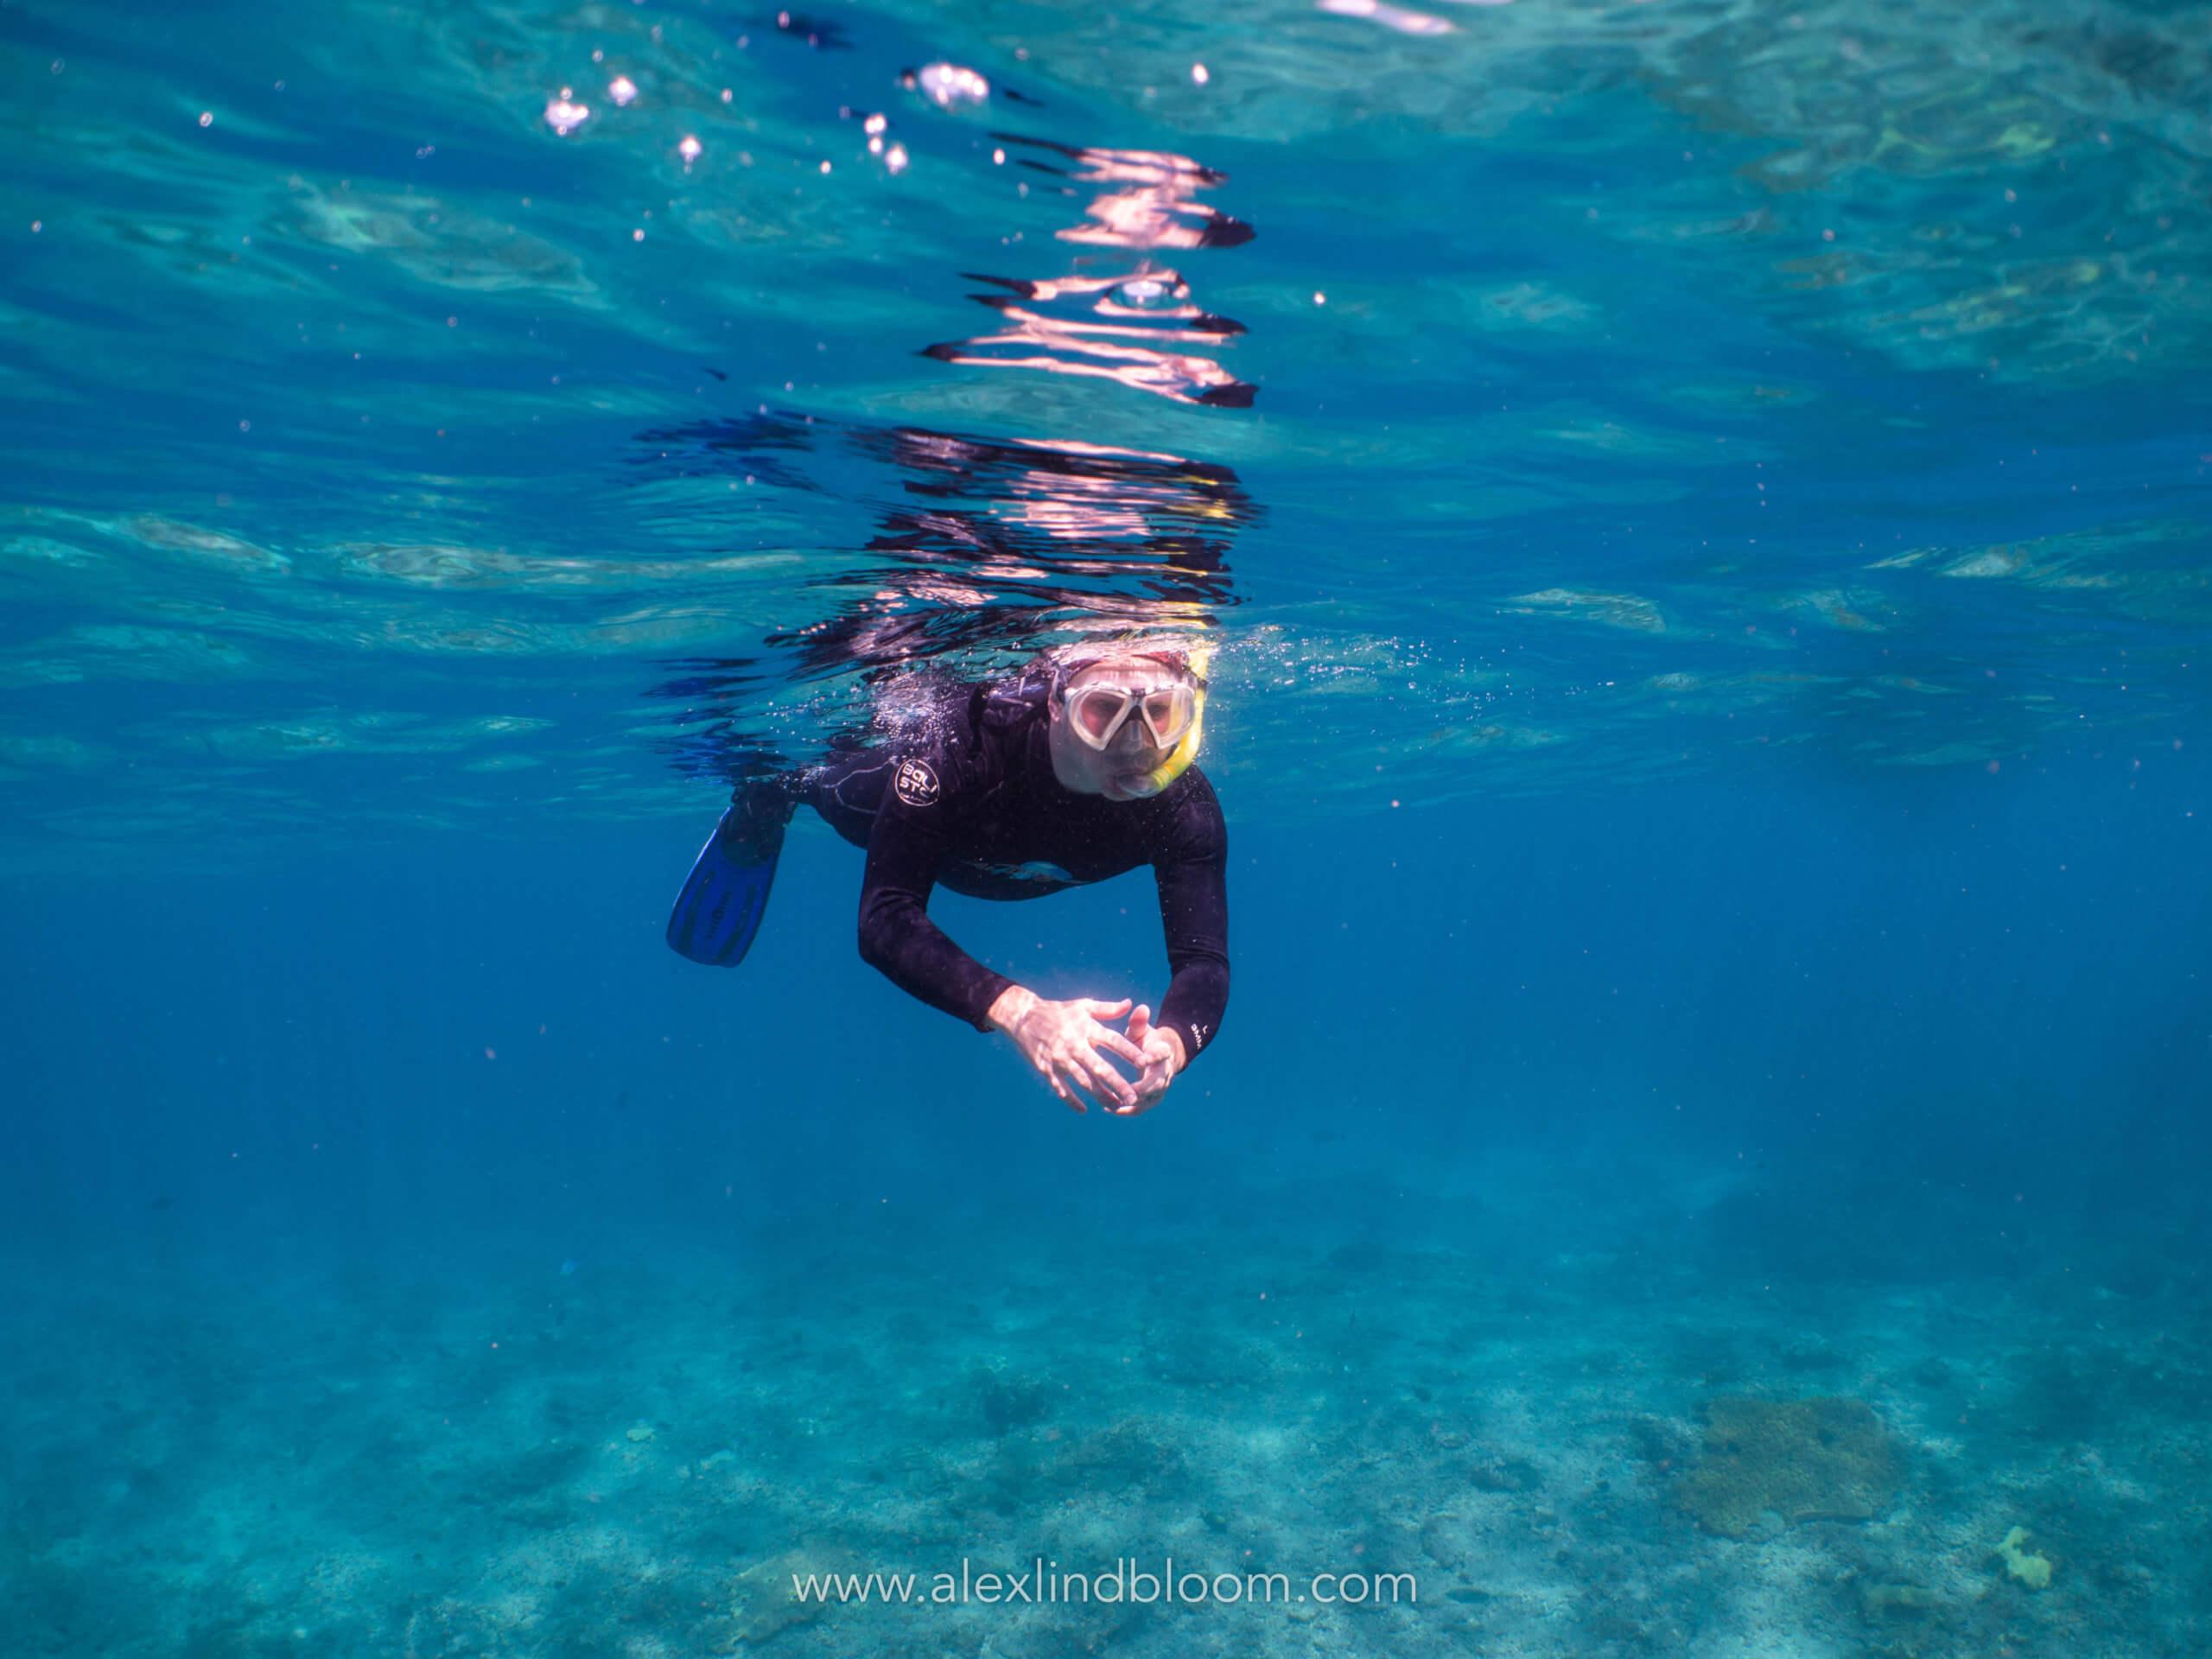 Snorkling à Bali